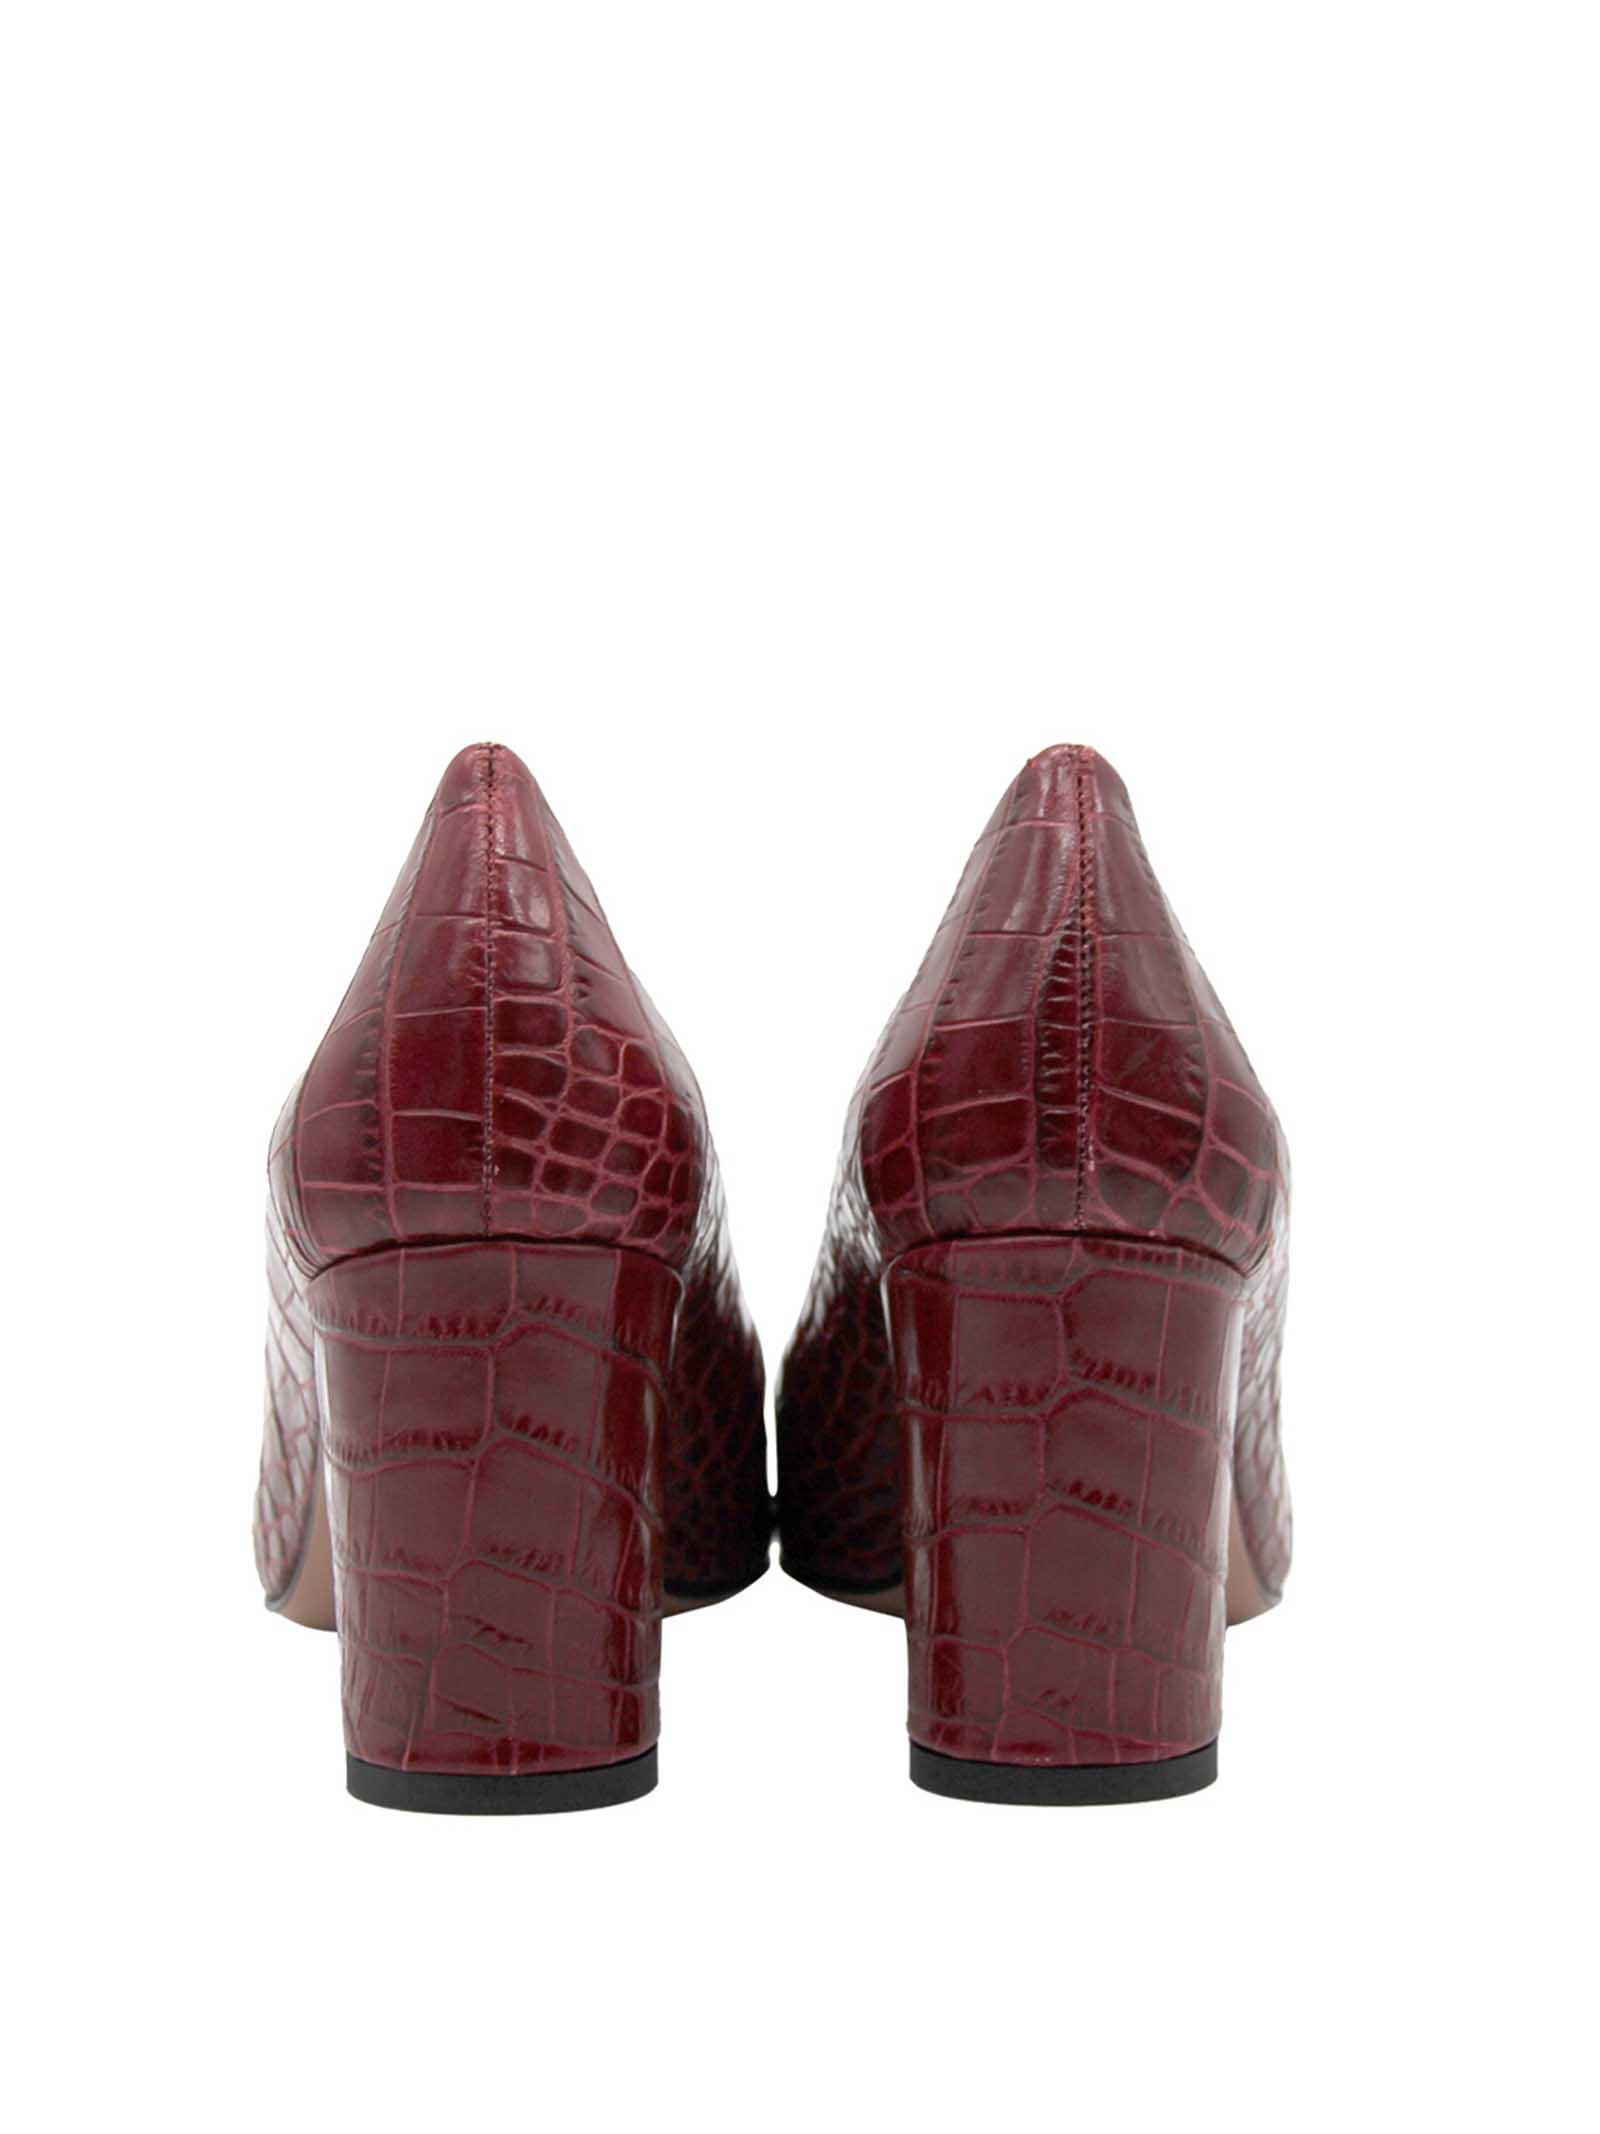 Women's High Heel Décolleté Fru | Pumps | 6201SROSSO